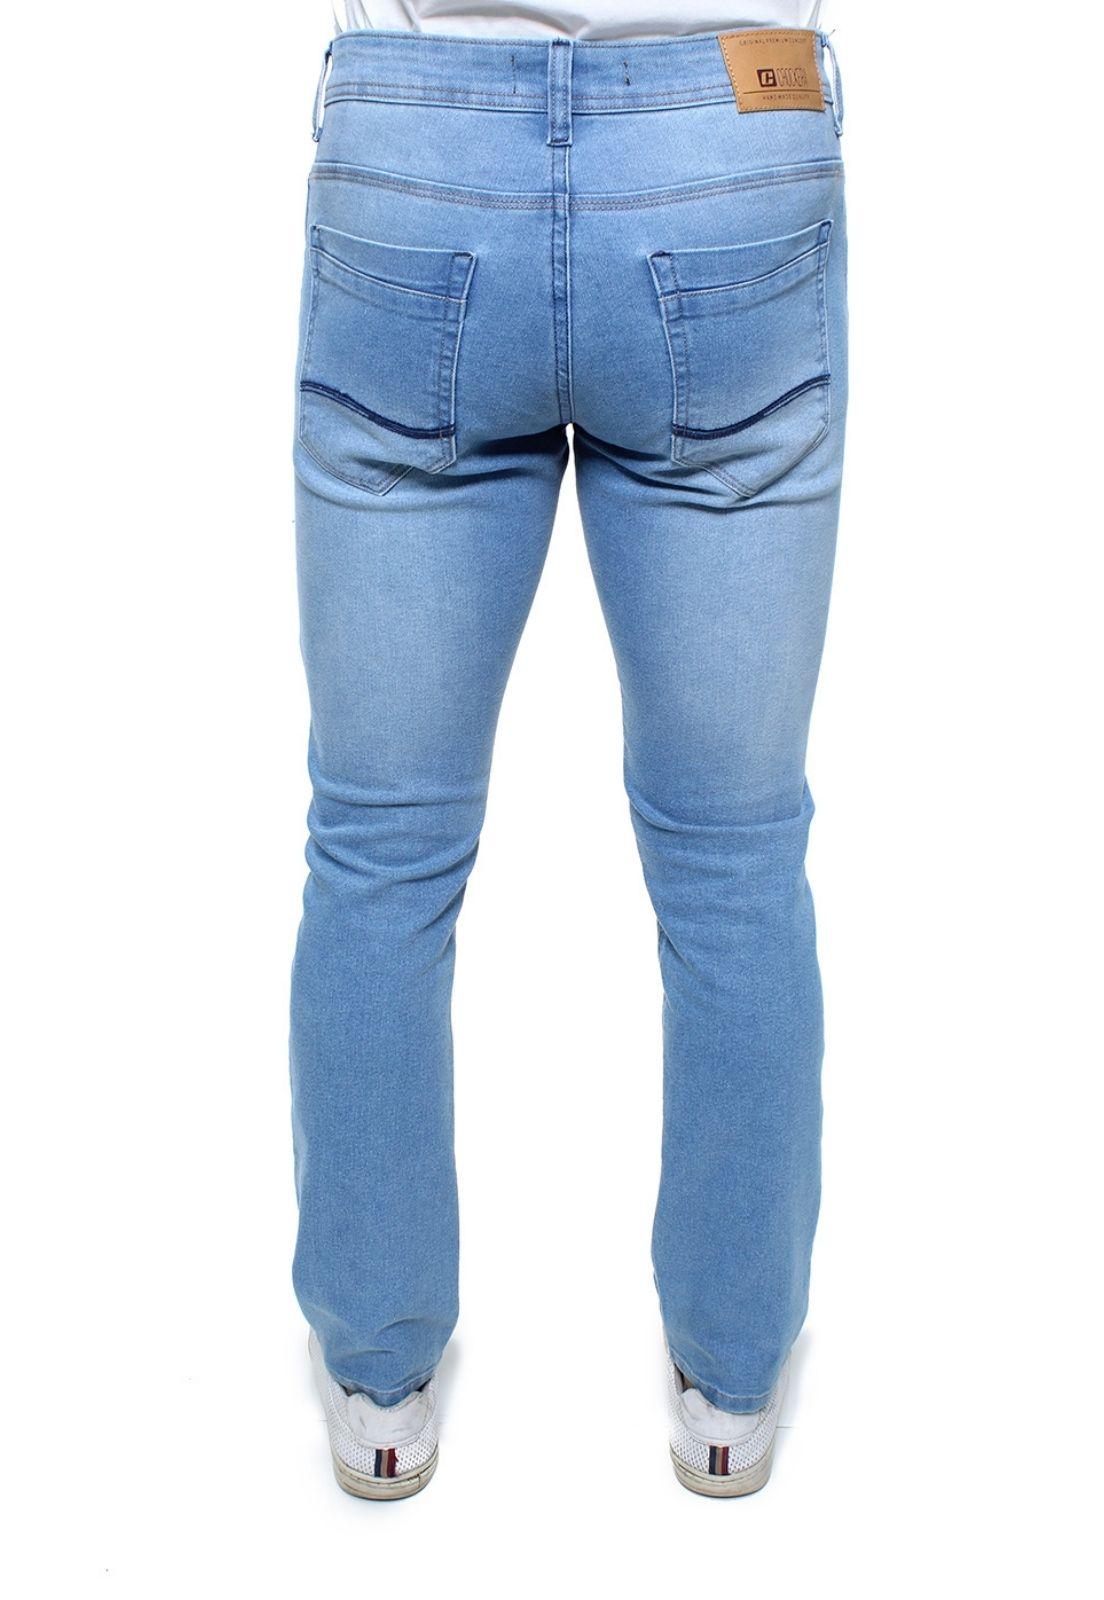 Calça Confort Jeans Masculina Crocker - 47761  - CROCKER JEANS